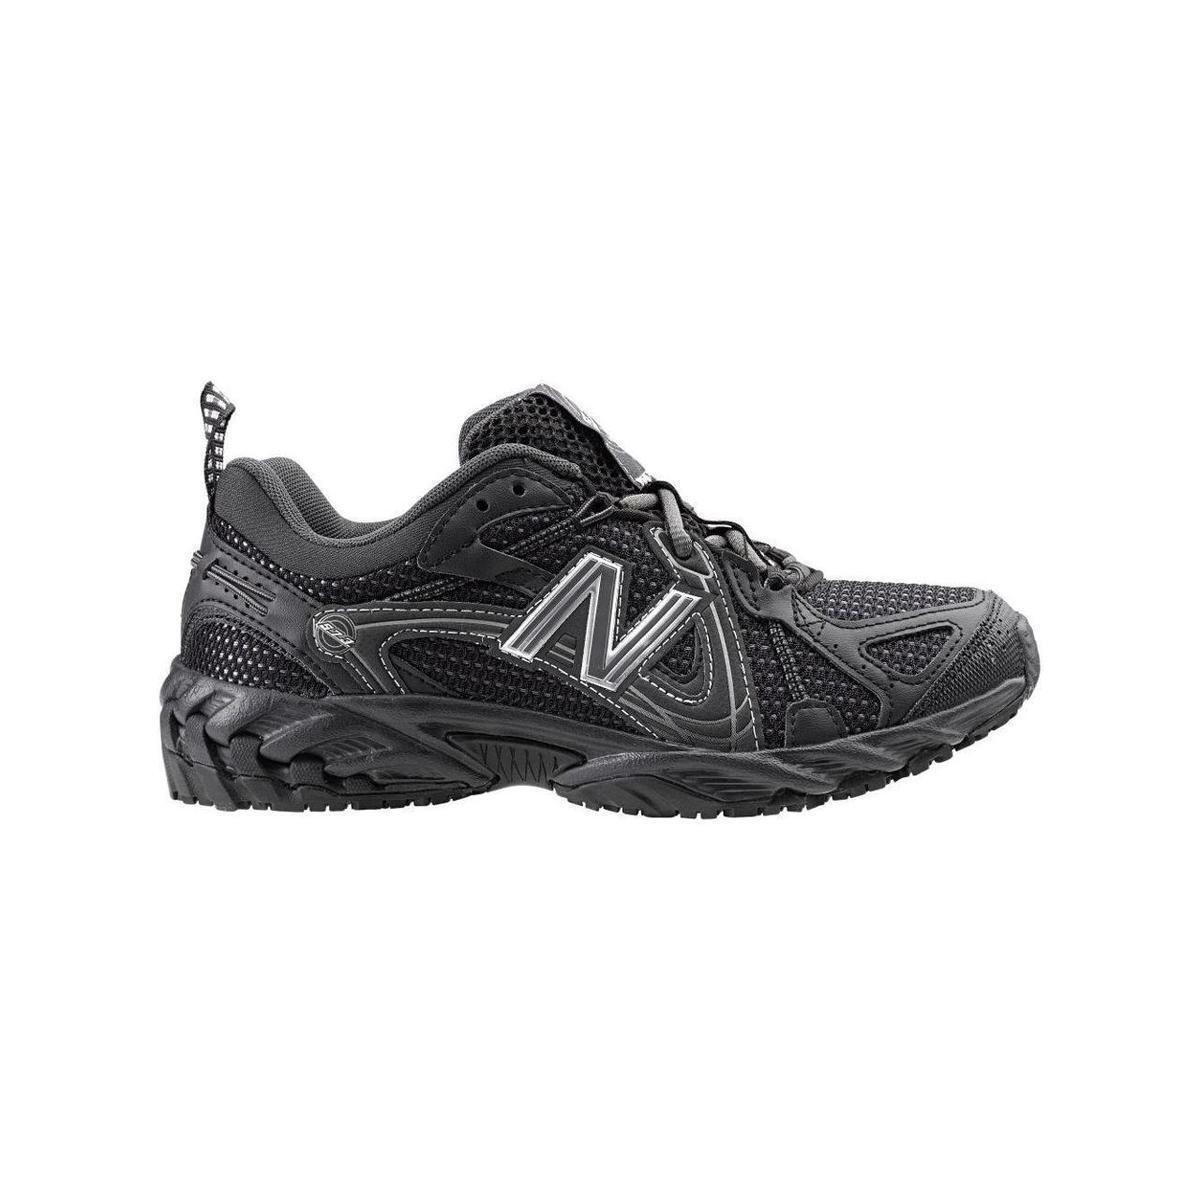 New Balance 573 SUREGRIP  work Womens Black/Gray Sneakers Sz 5 M